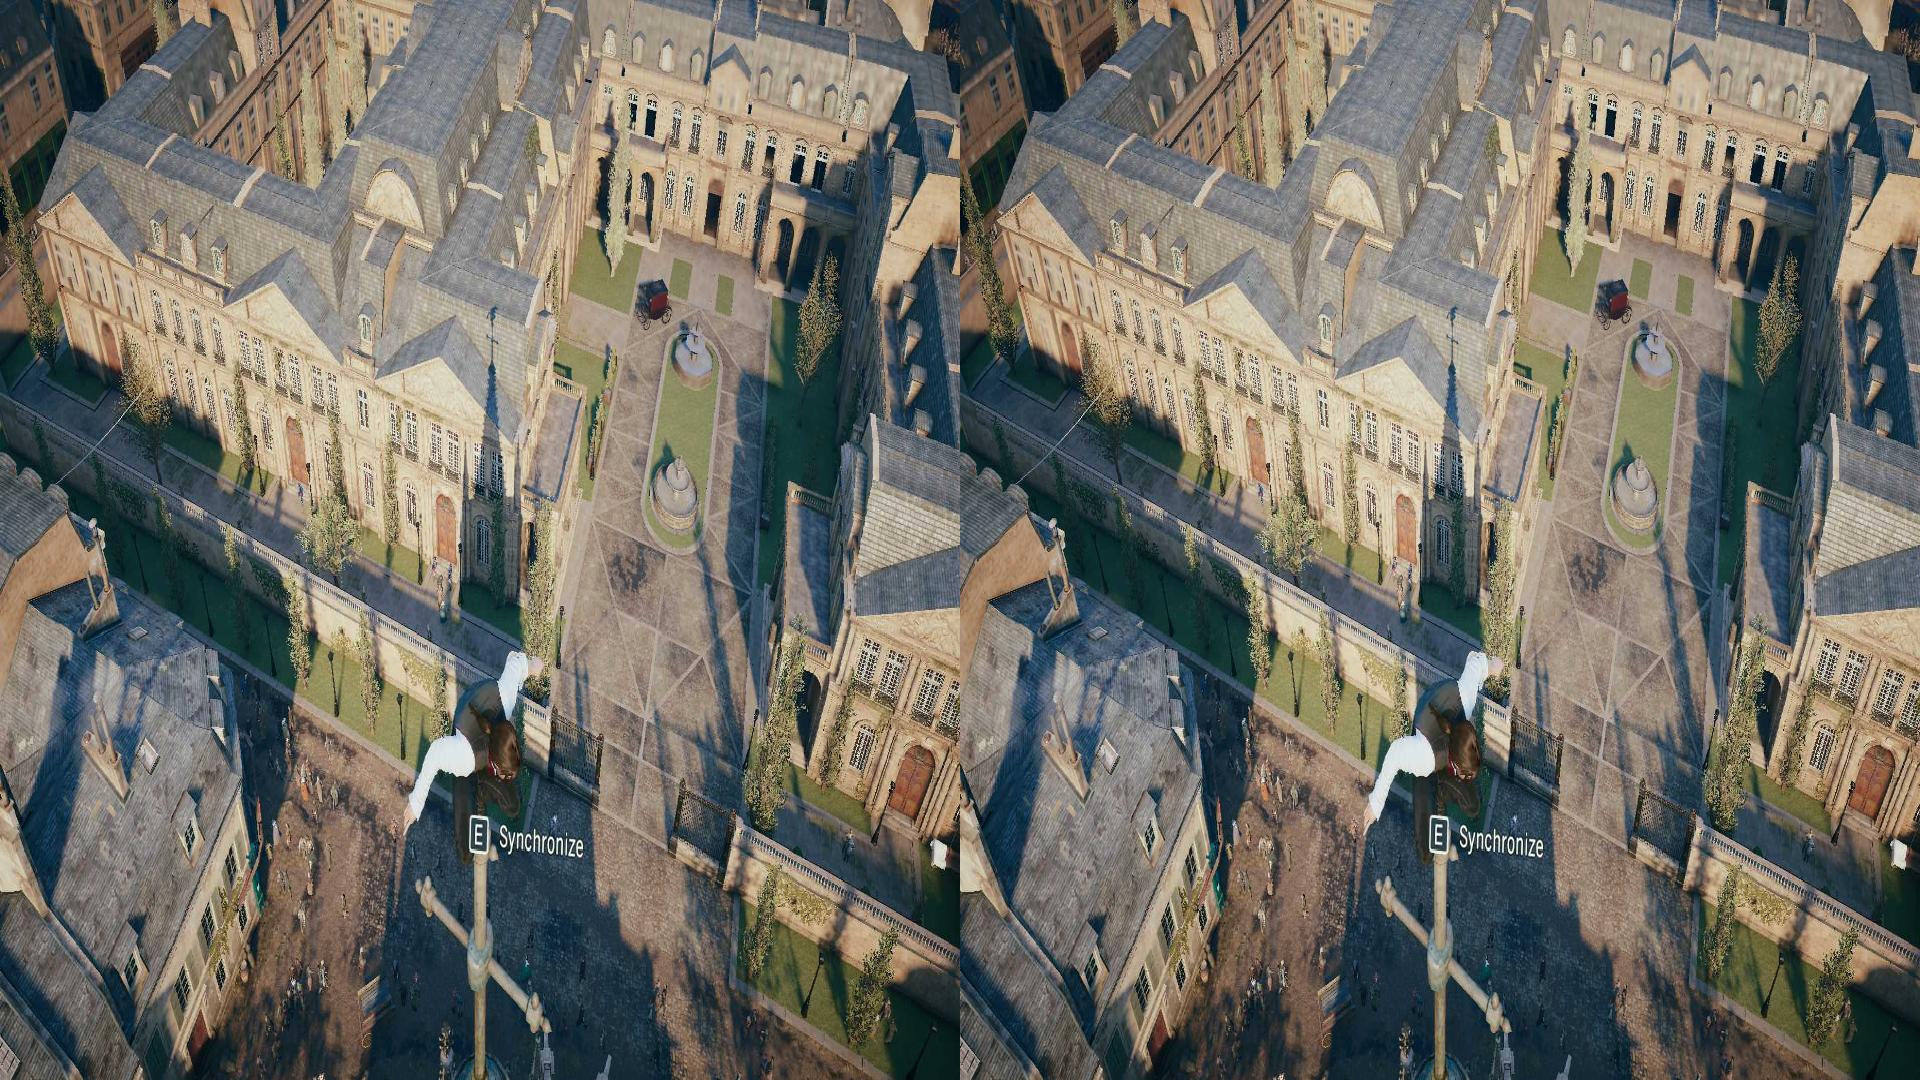 Assassins Creed Unity Animated Desktop Wallpaper